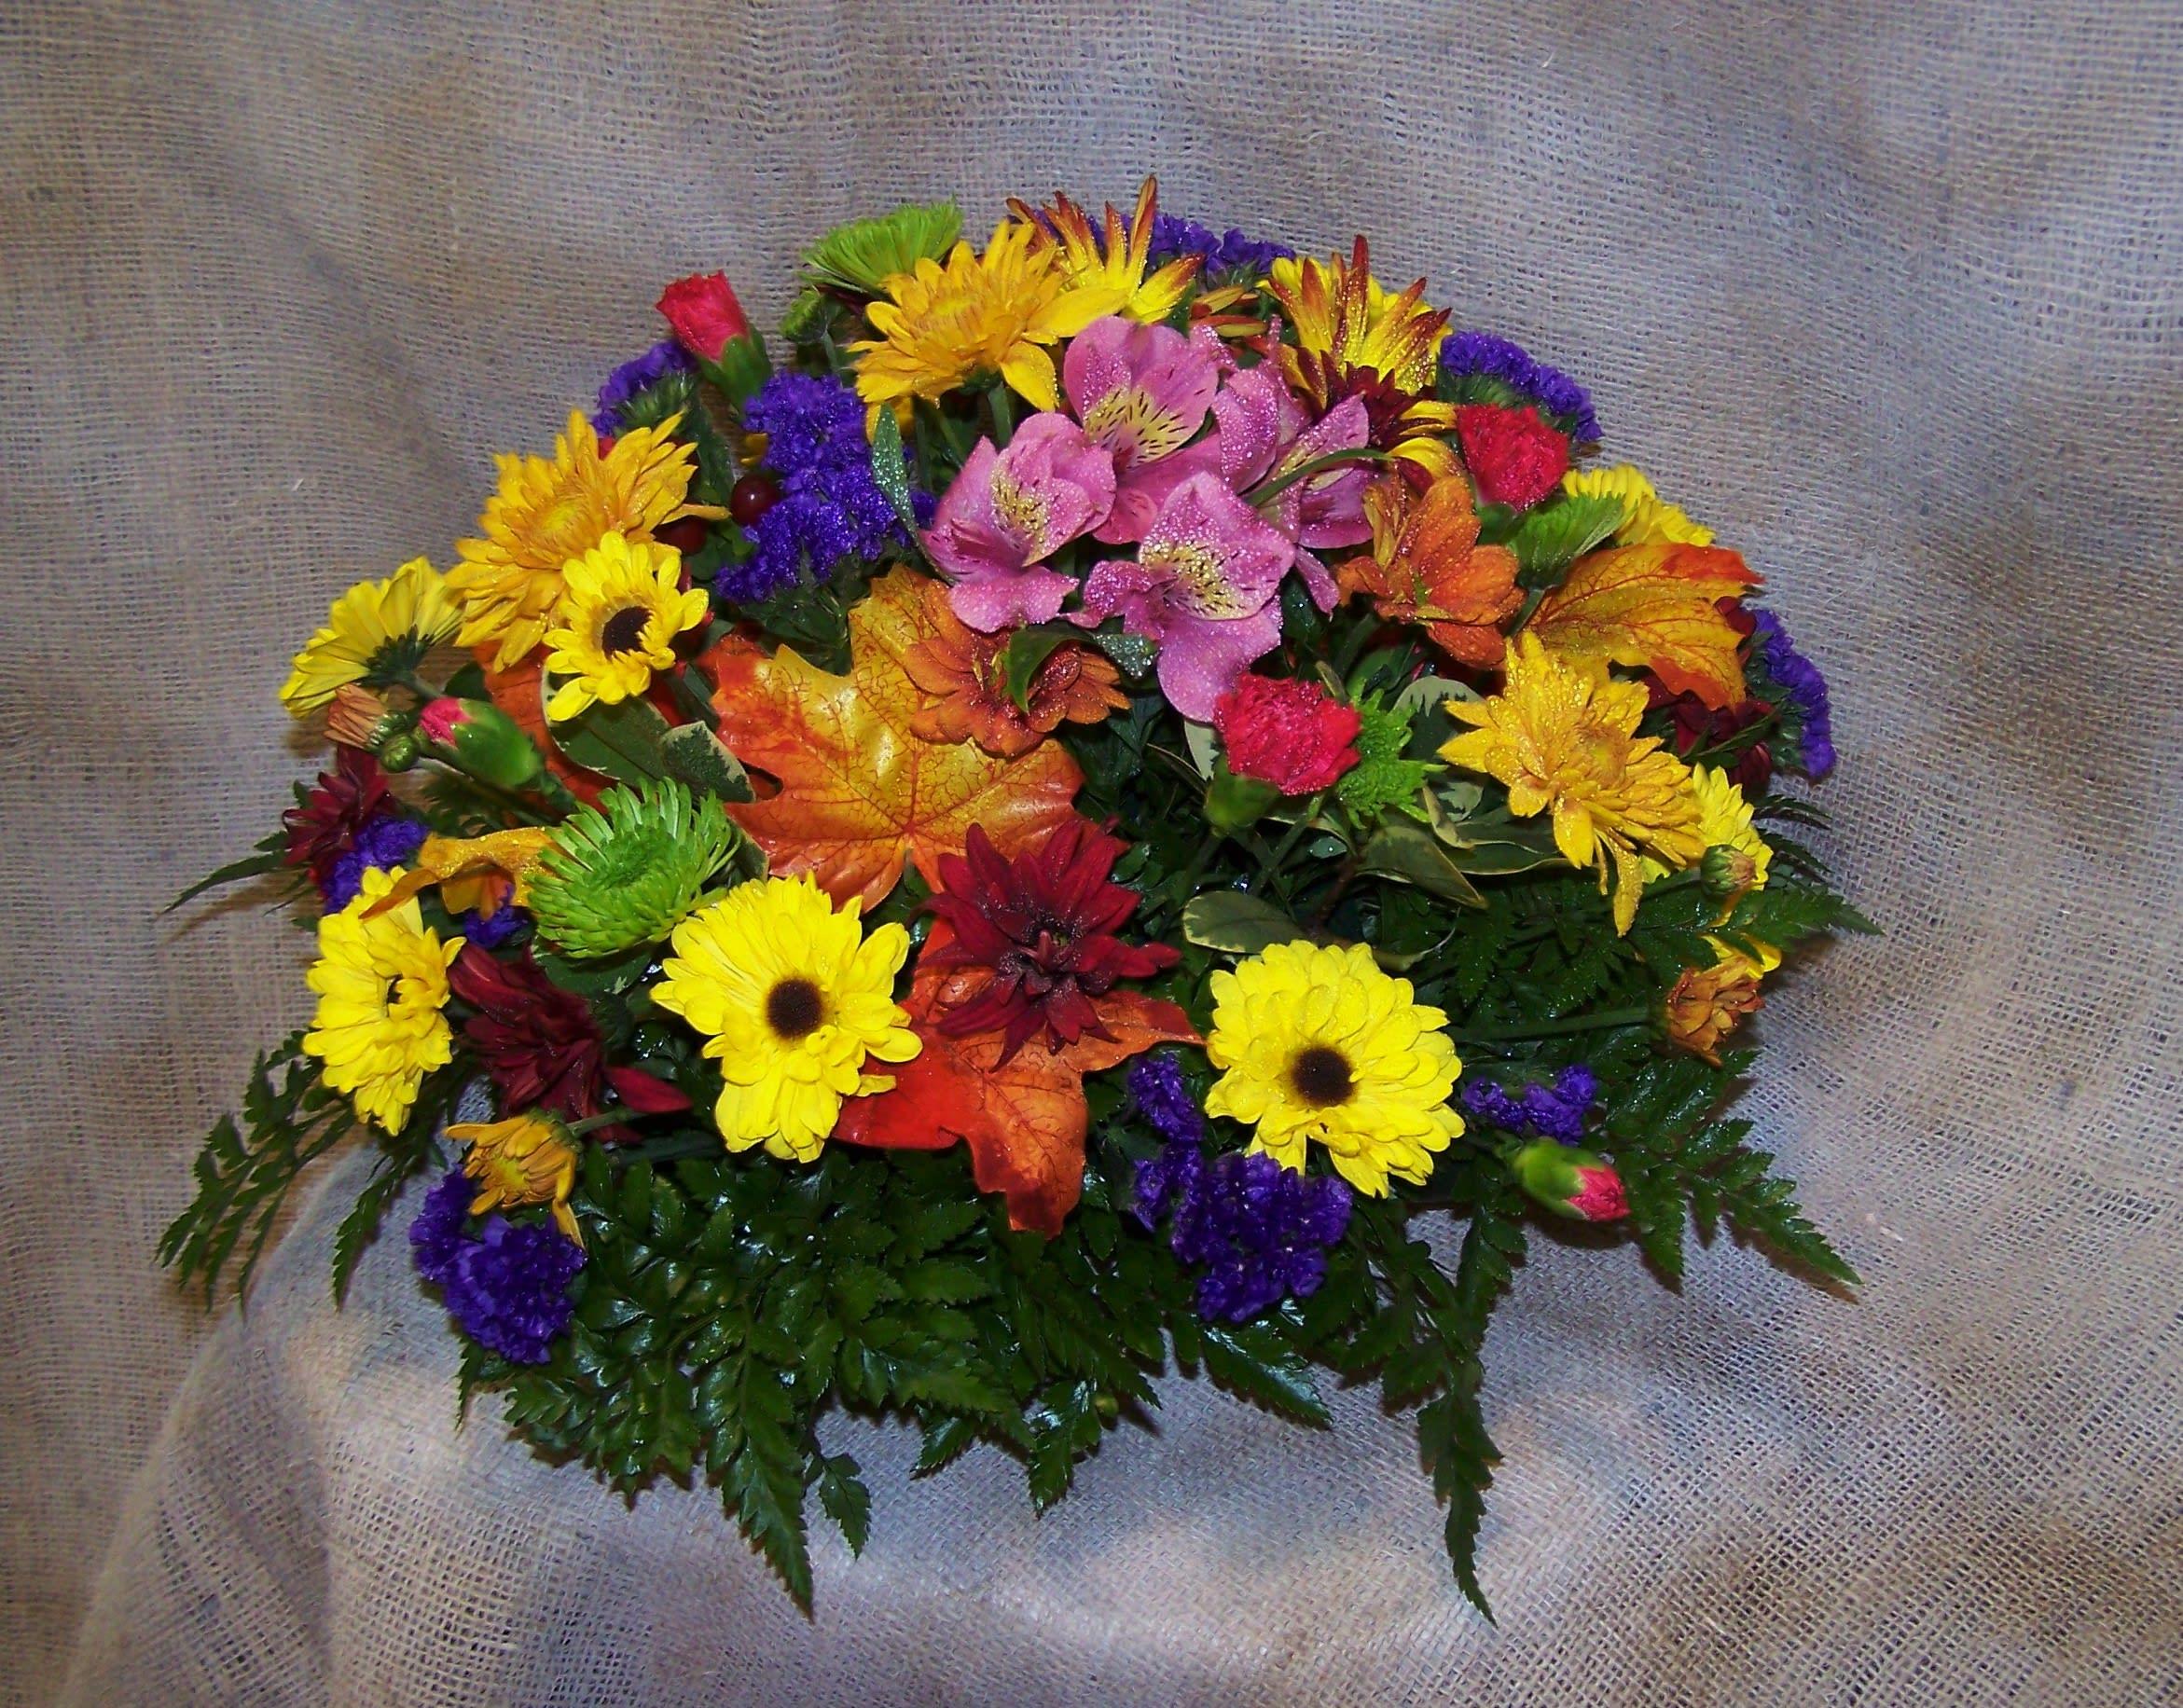 Colorful Round Table Centerpiece In Bellevue Ne Bellevue Florist